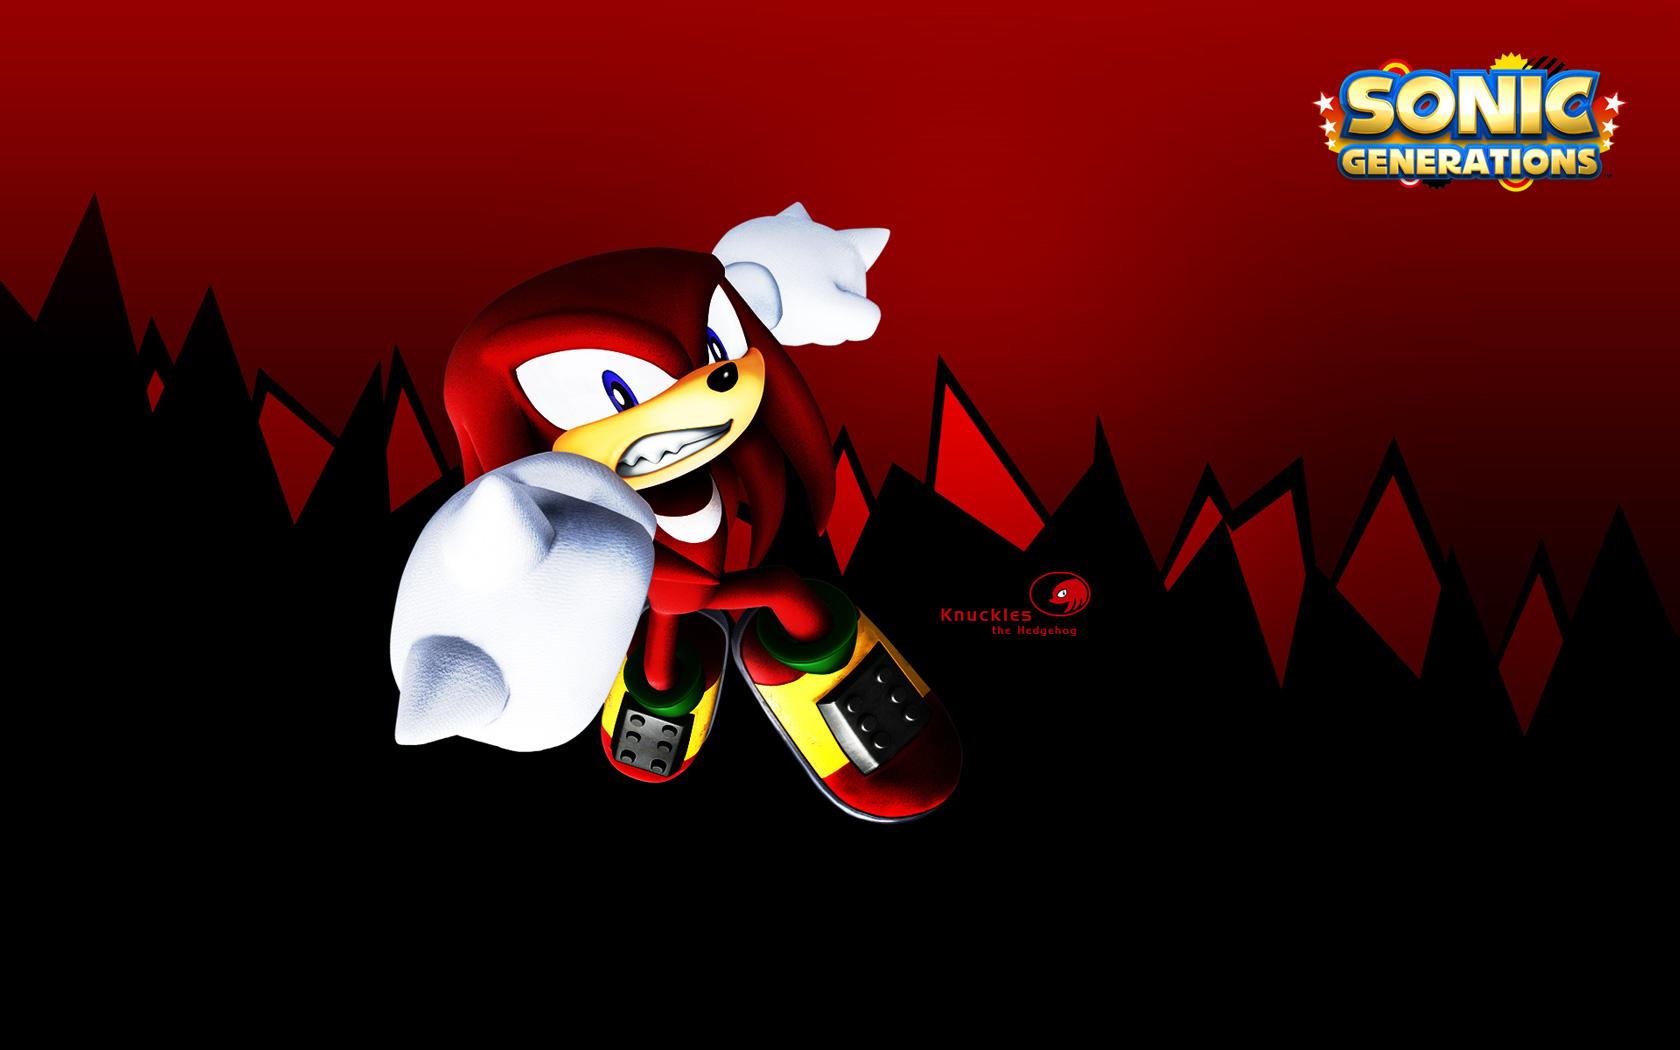 Free Sonic Generations Wallpaper in 1680x1050